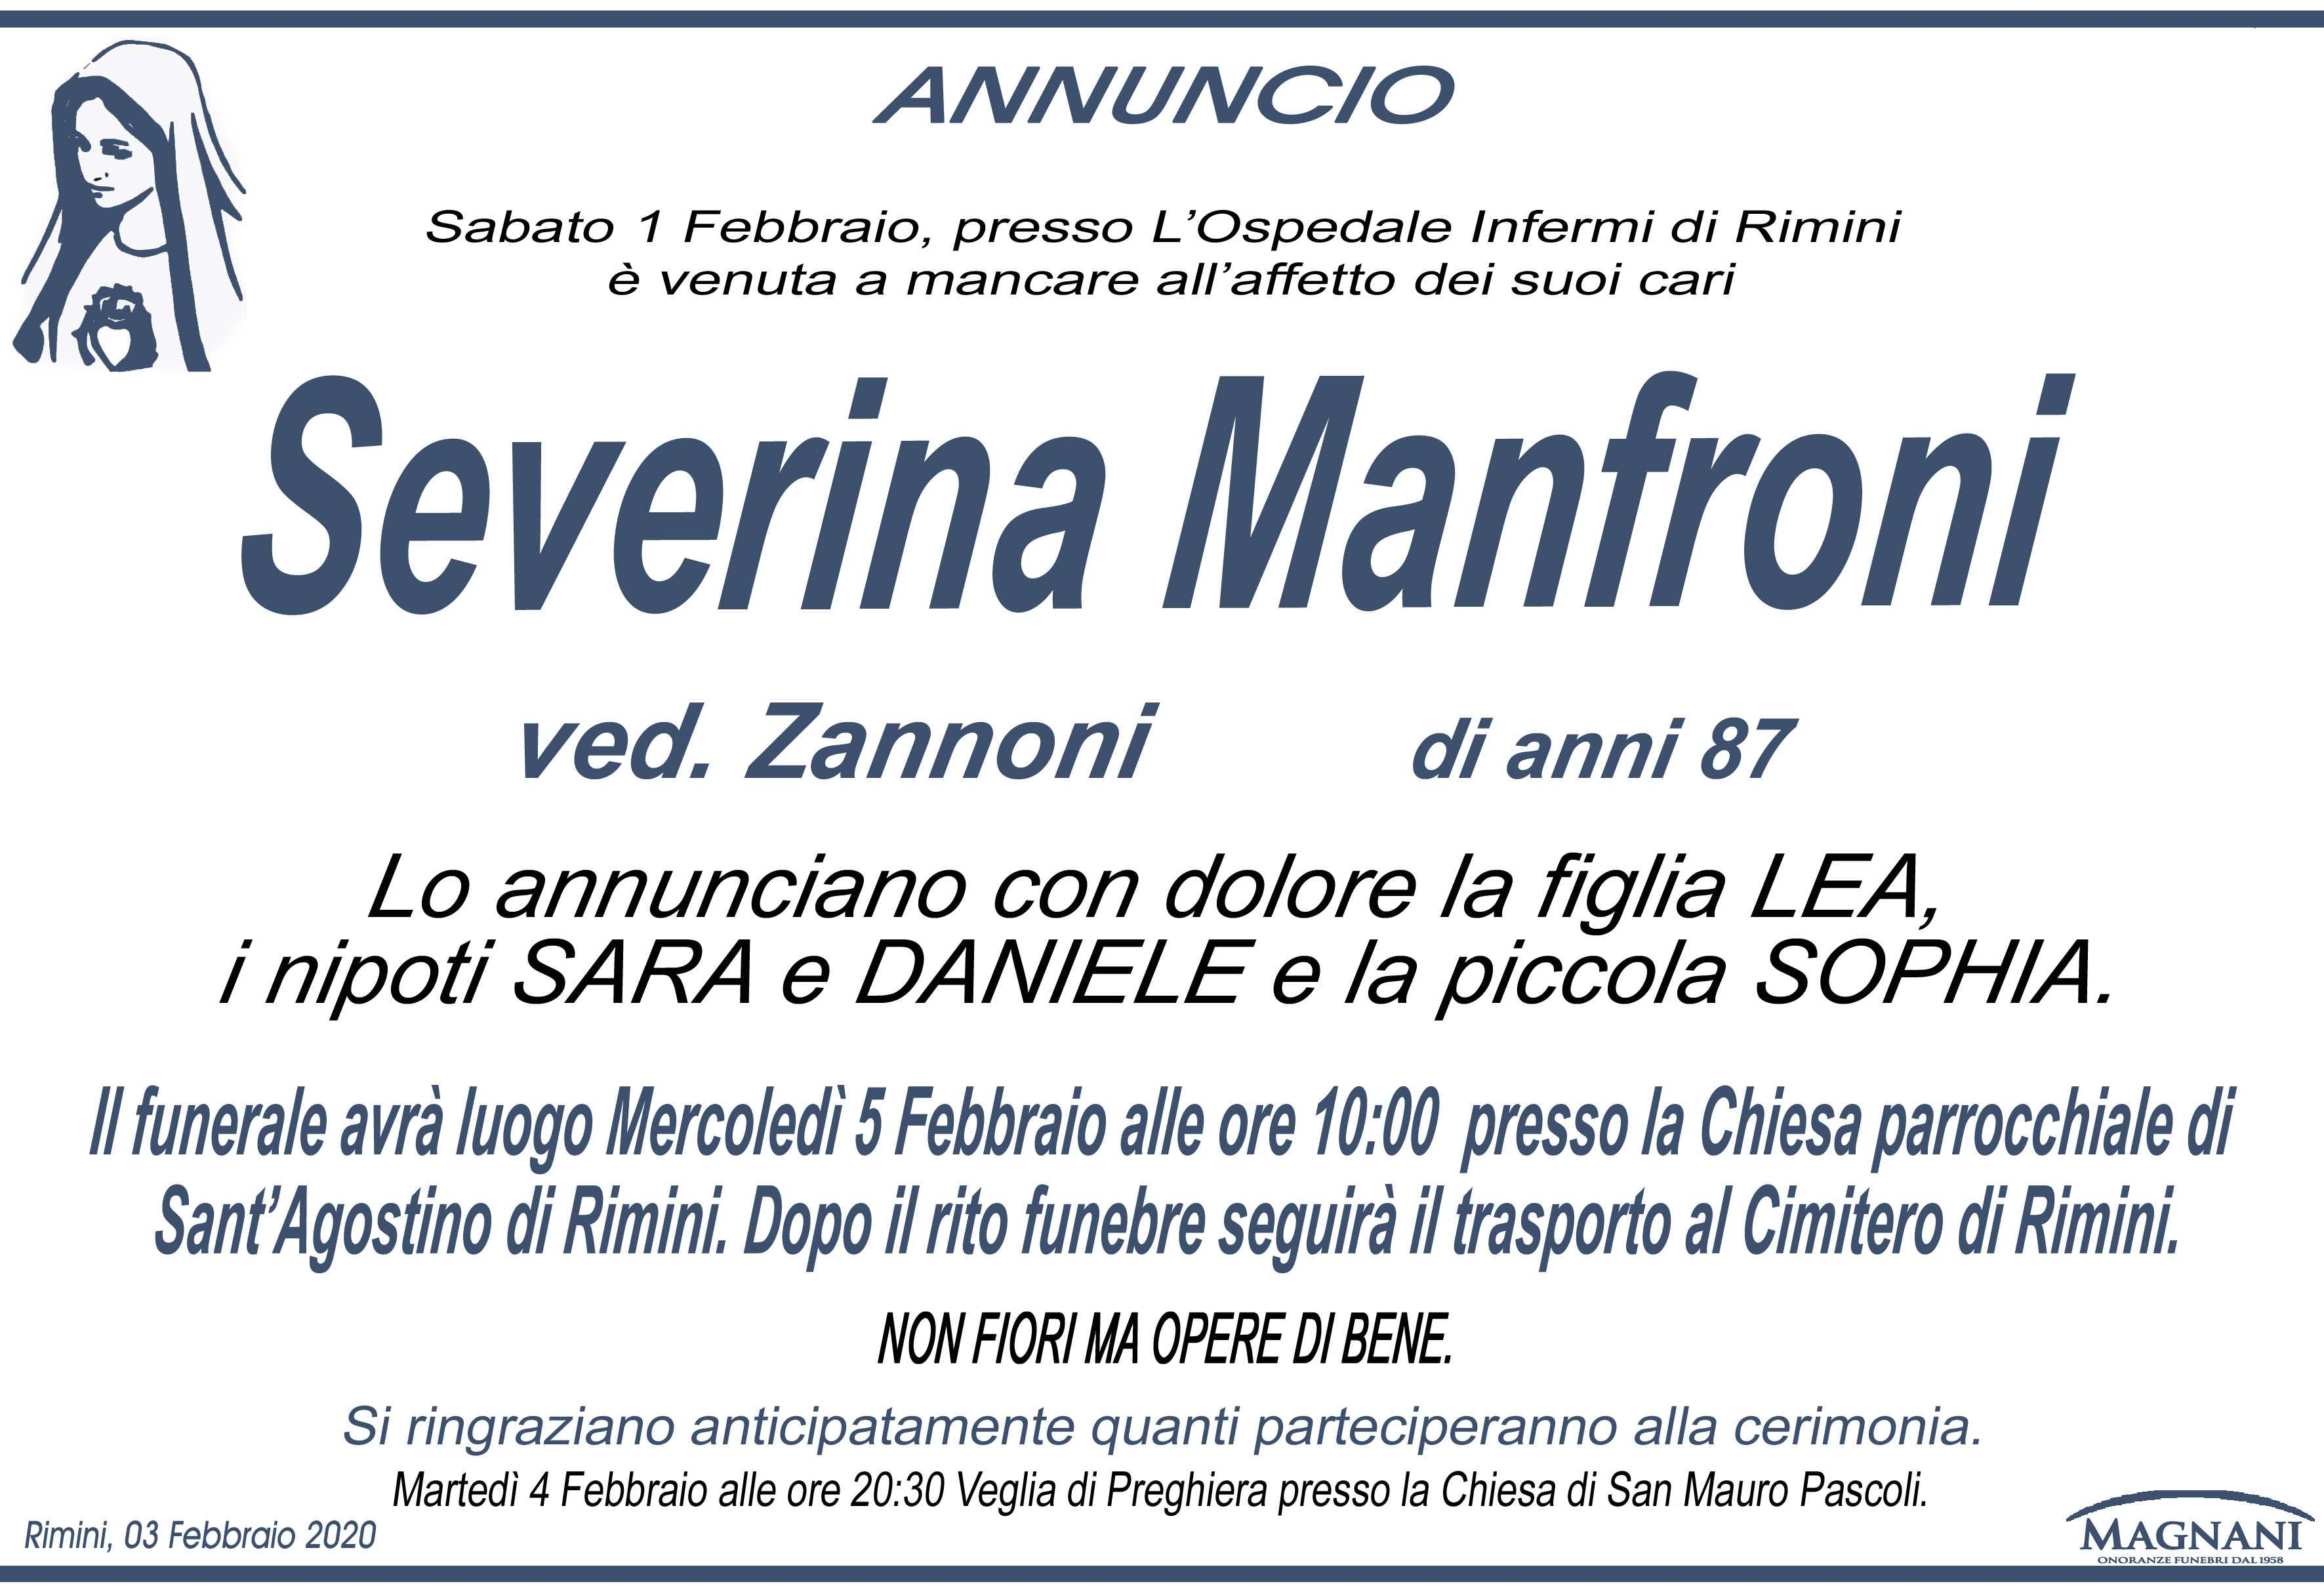 Severina Manfroni